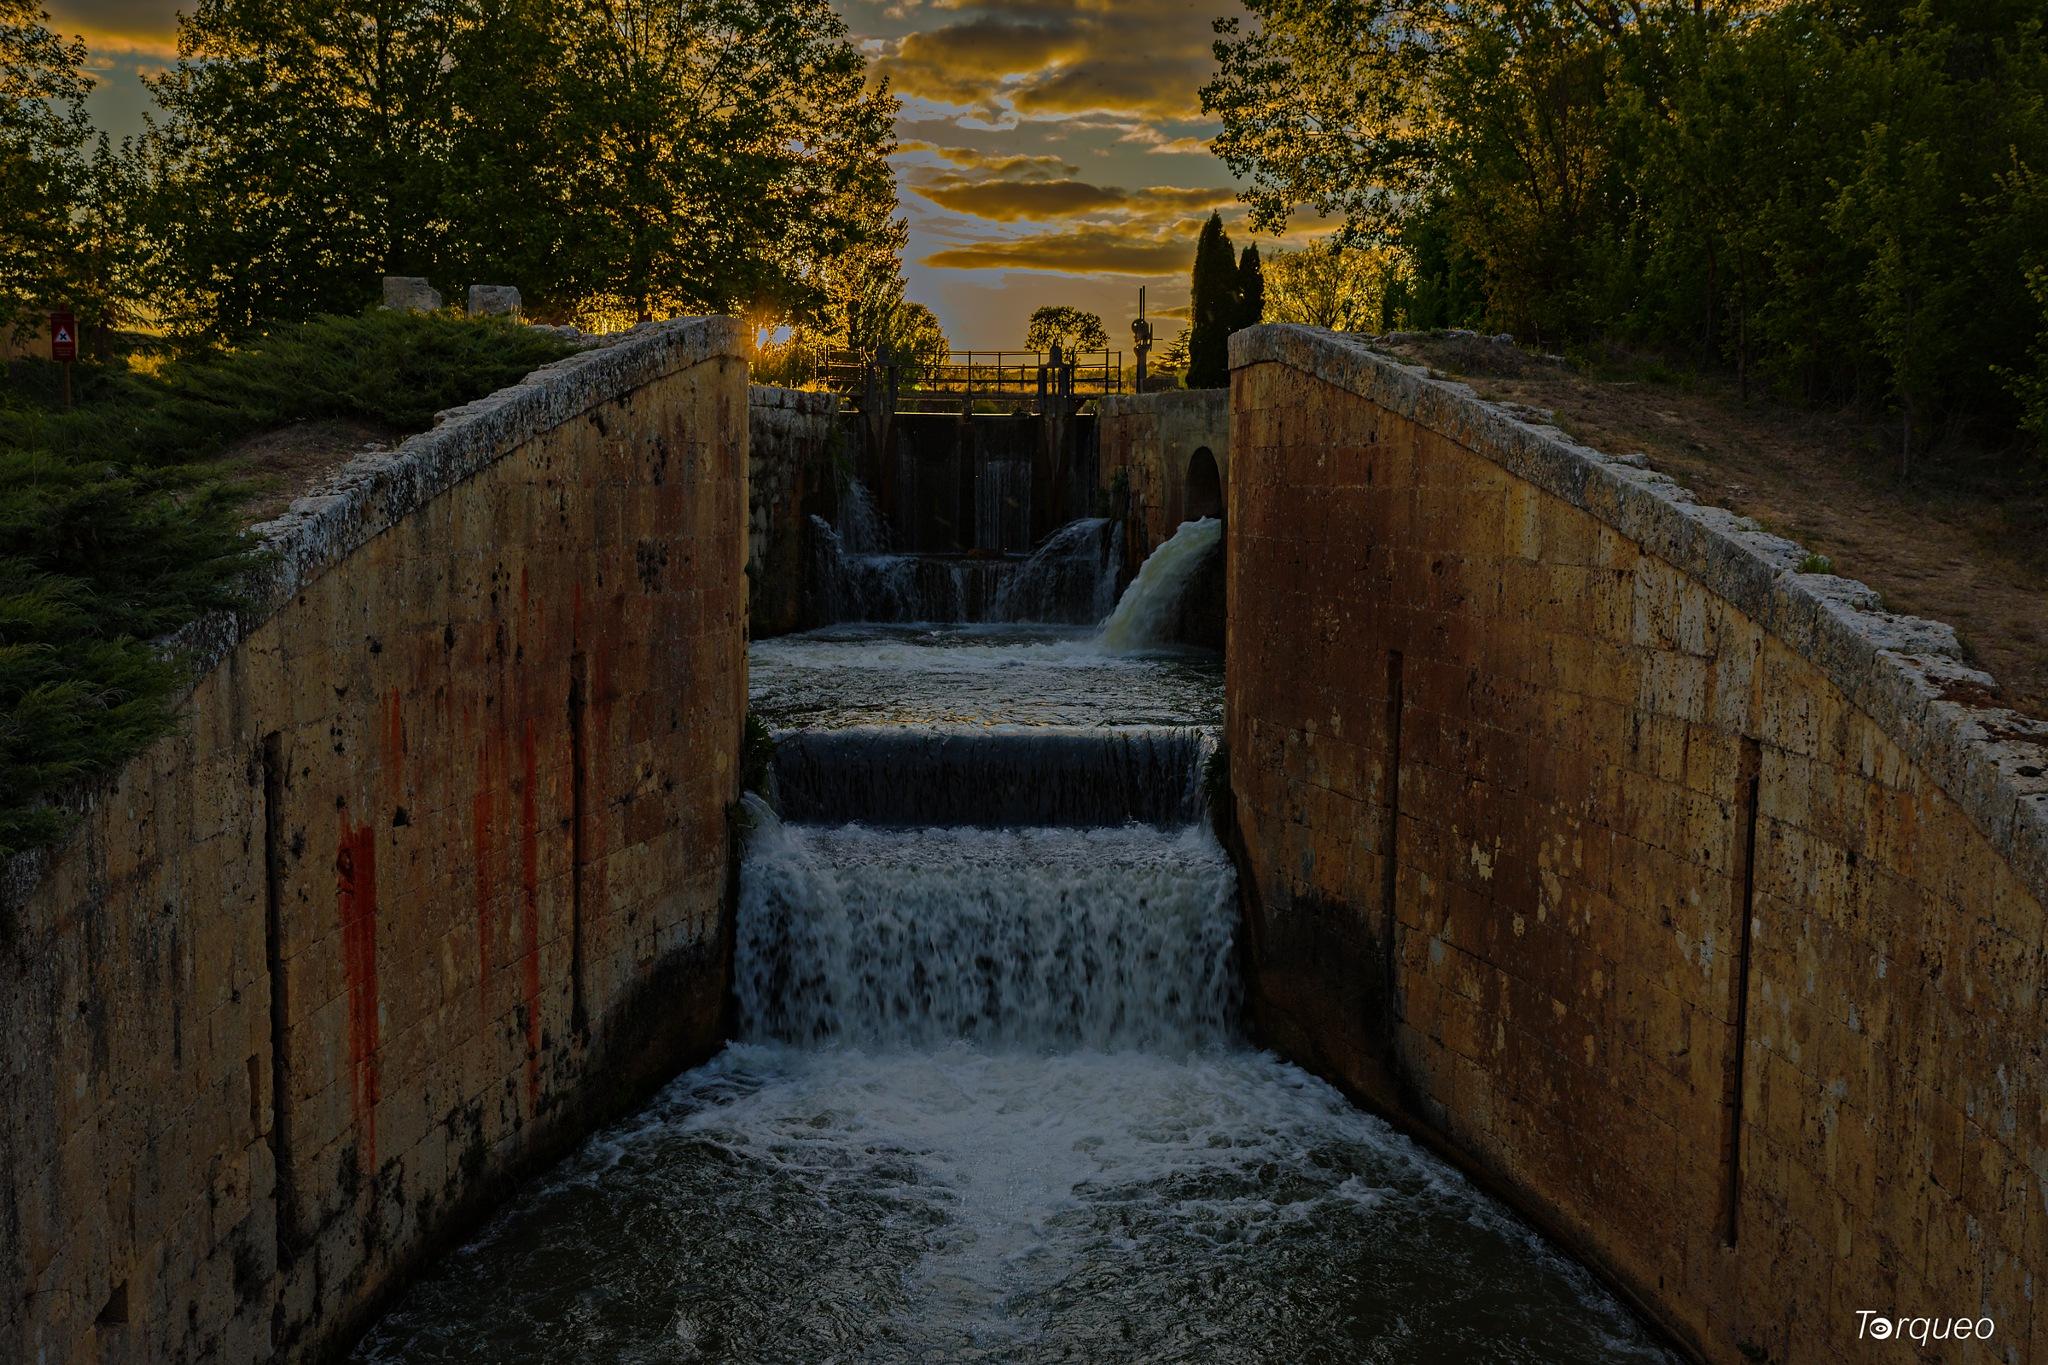 Palencia, Canal de Castilla: Esclusas 31 &32 cerca de Viñalta by Torqueo